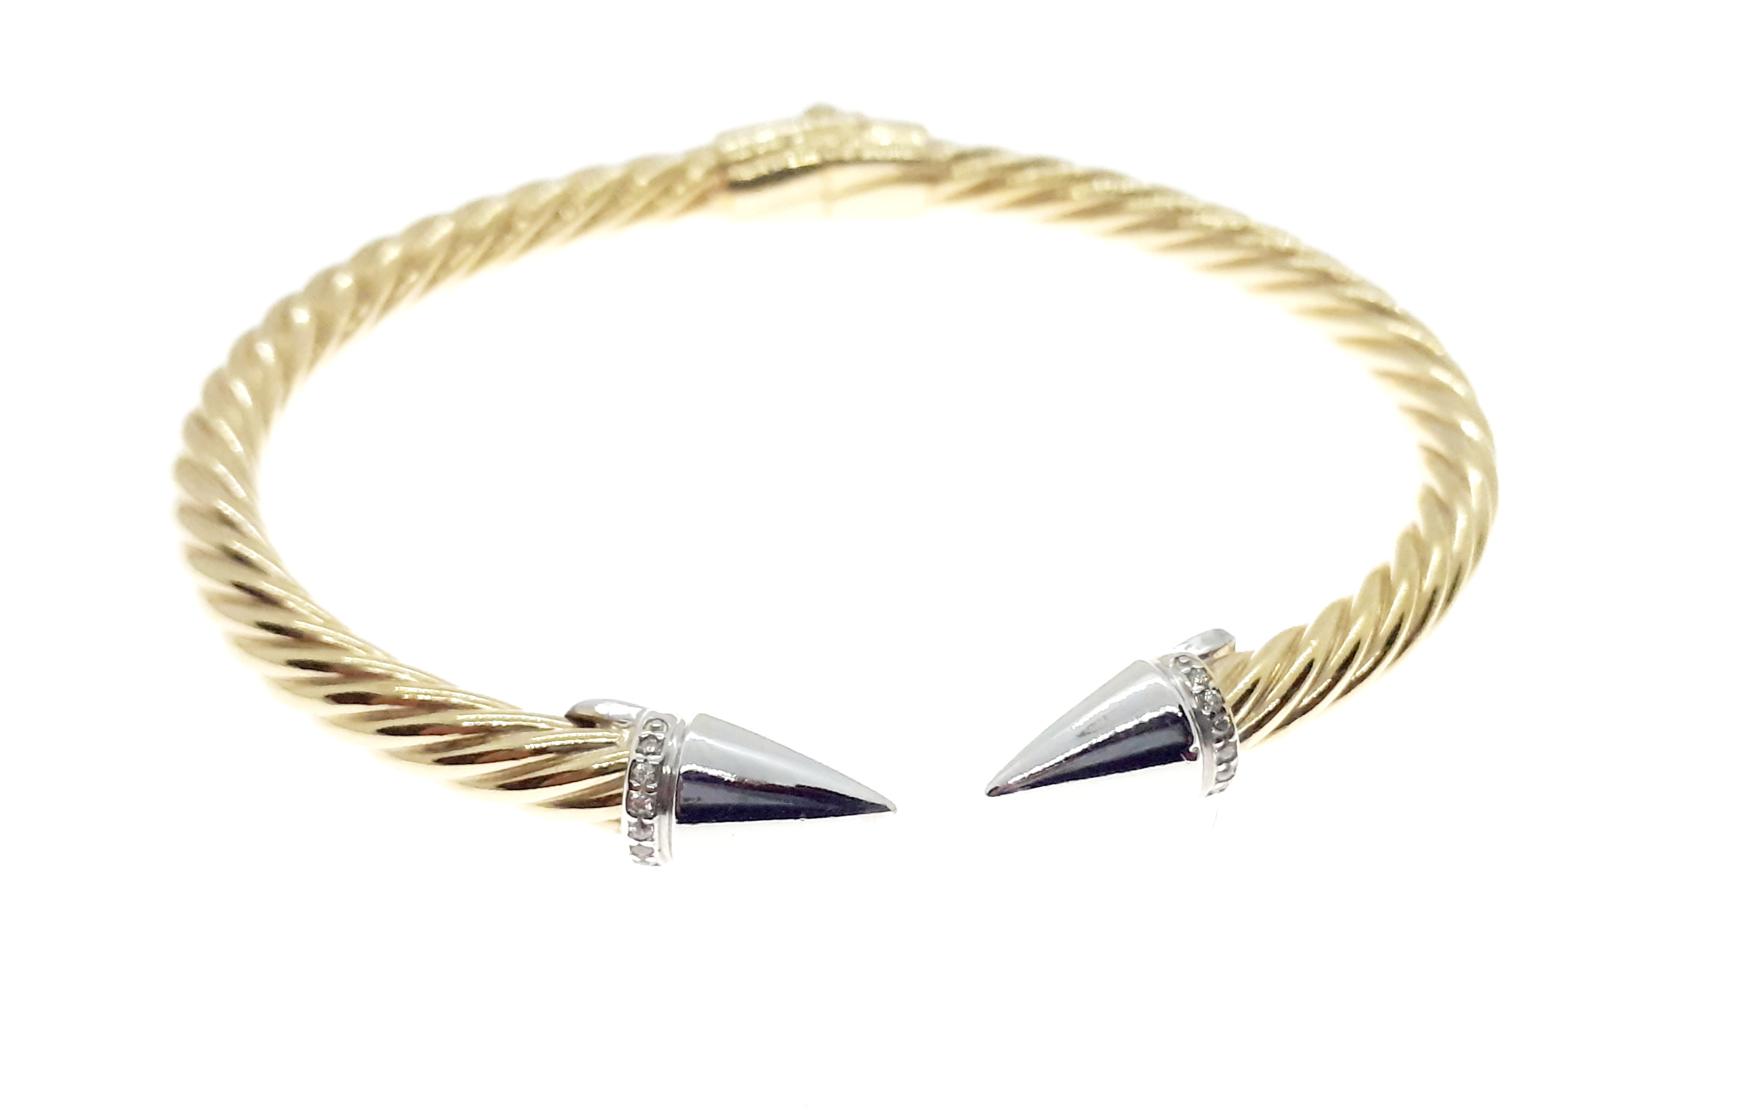 Sensi joyas jewellery Granada silver engagementSILVER BRACELET GOLD COATING